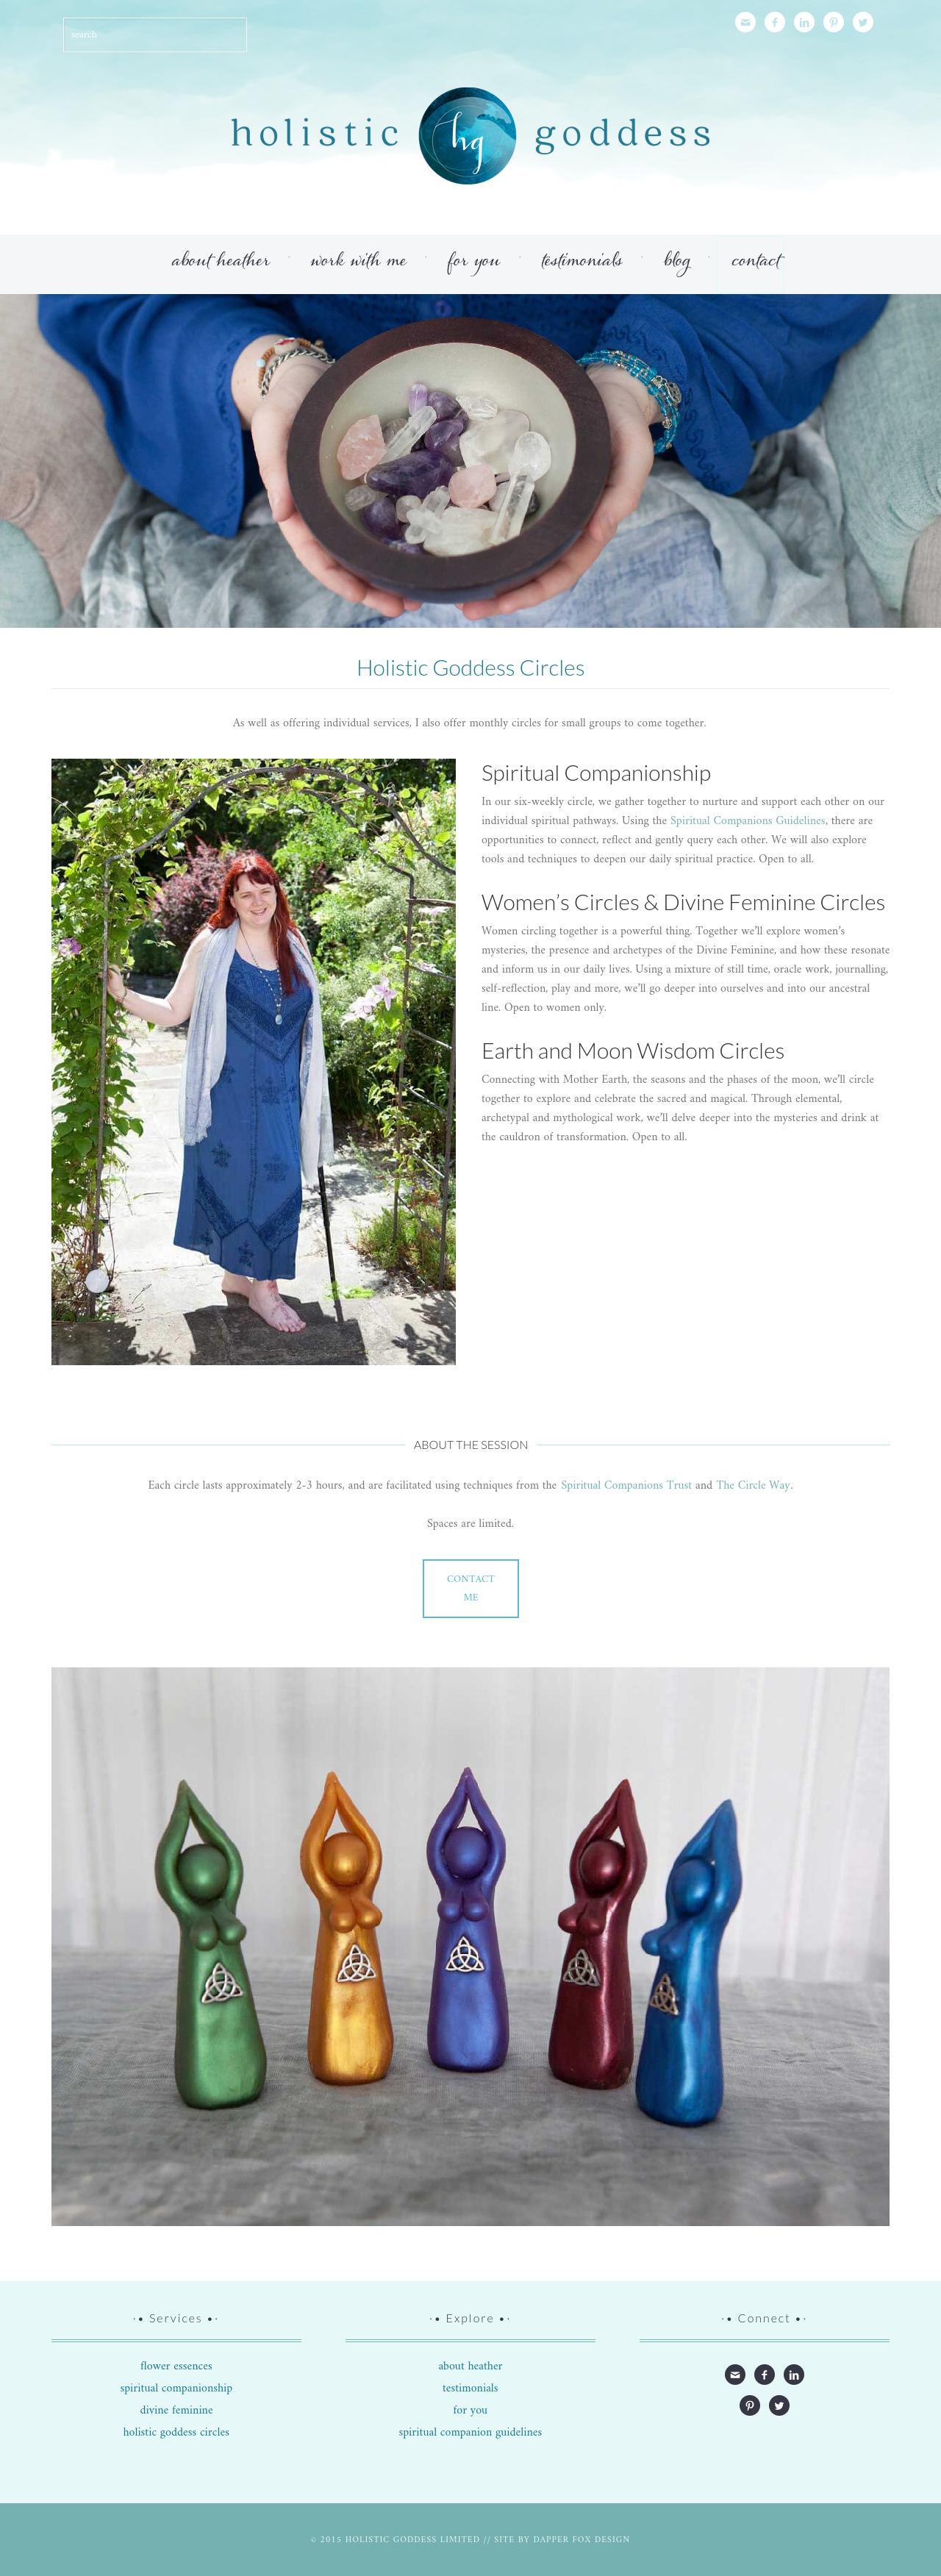 Holistic Goddess Website Design by Dapper Fox Design - Modern Website Design, blue, elegant, sleek, ocean